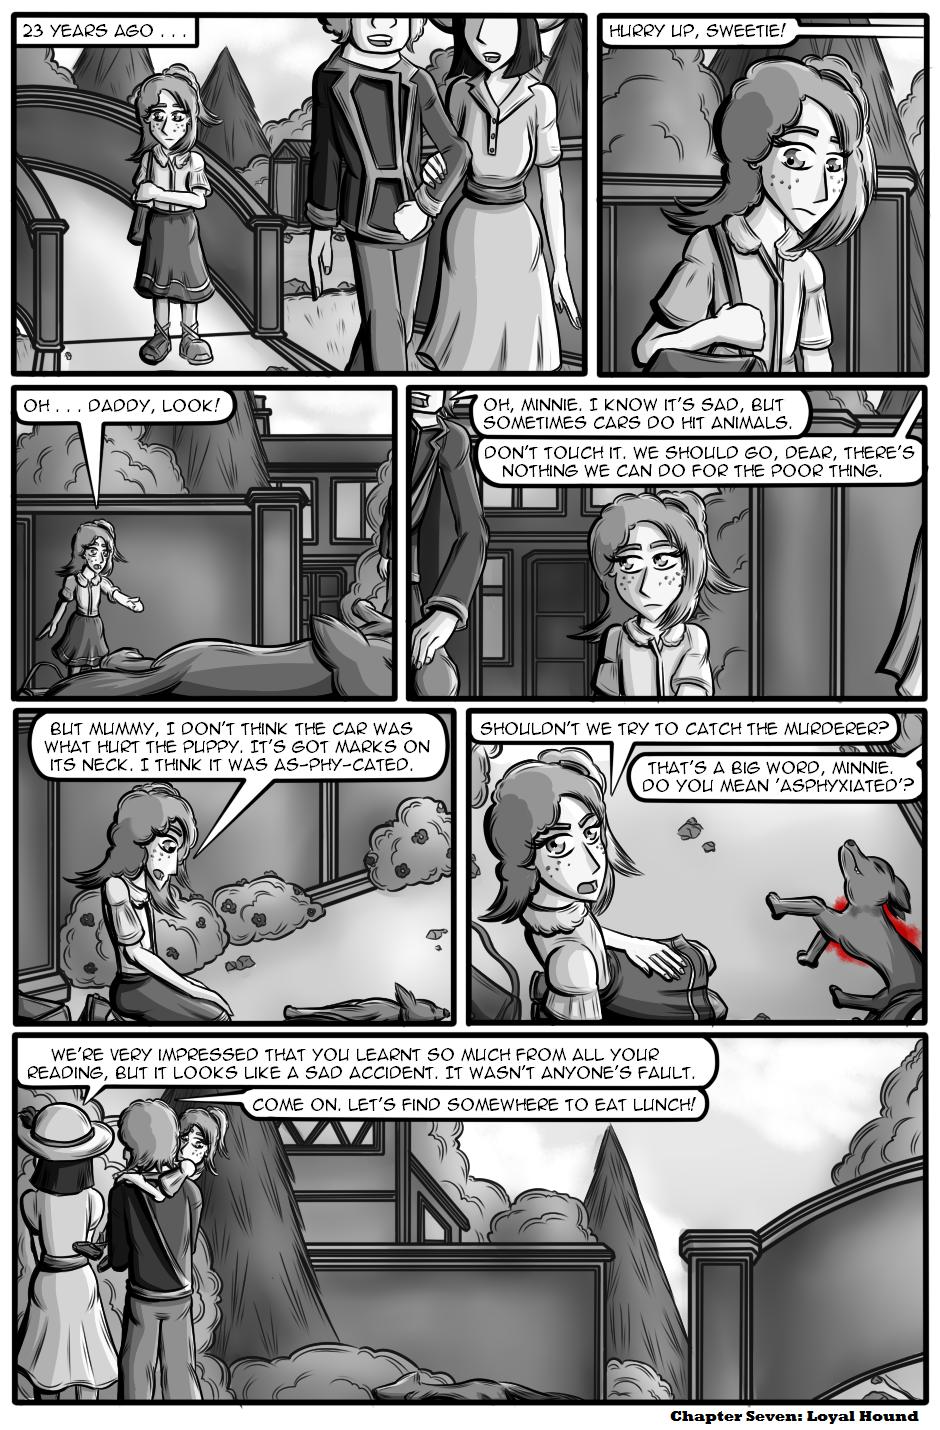 Loyal Hound - Part 1